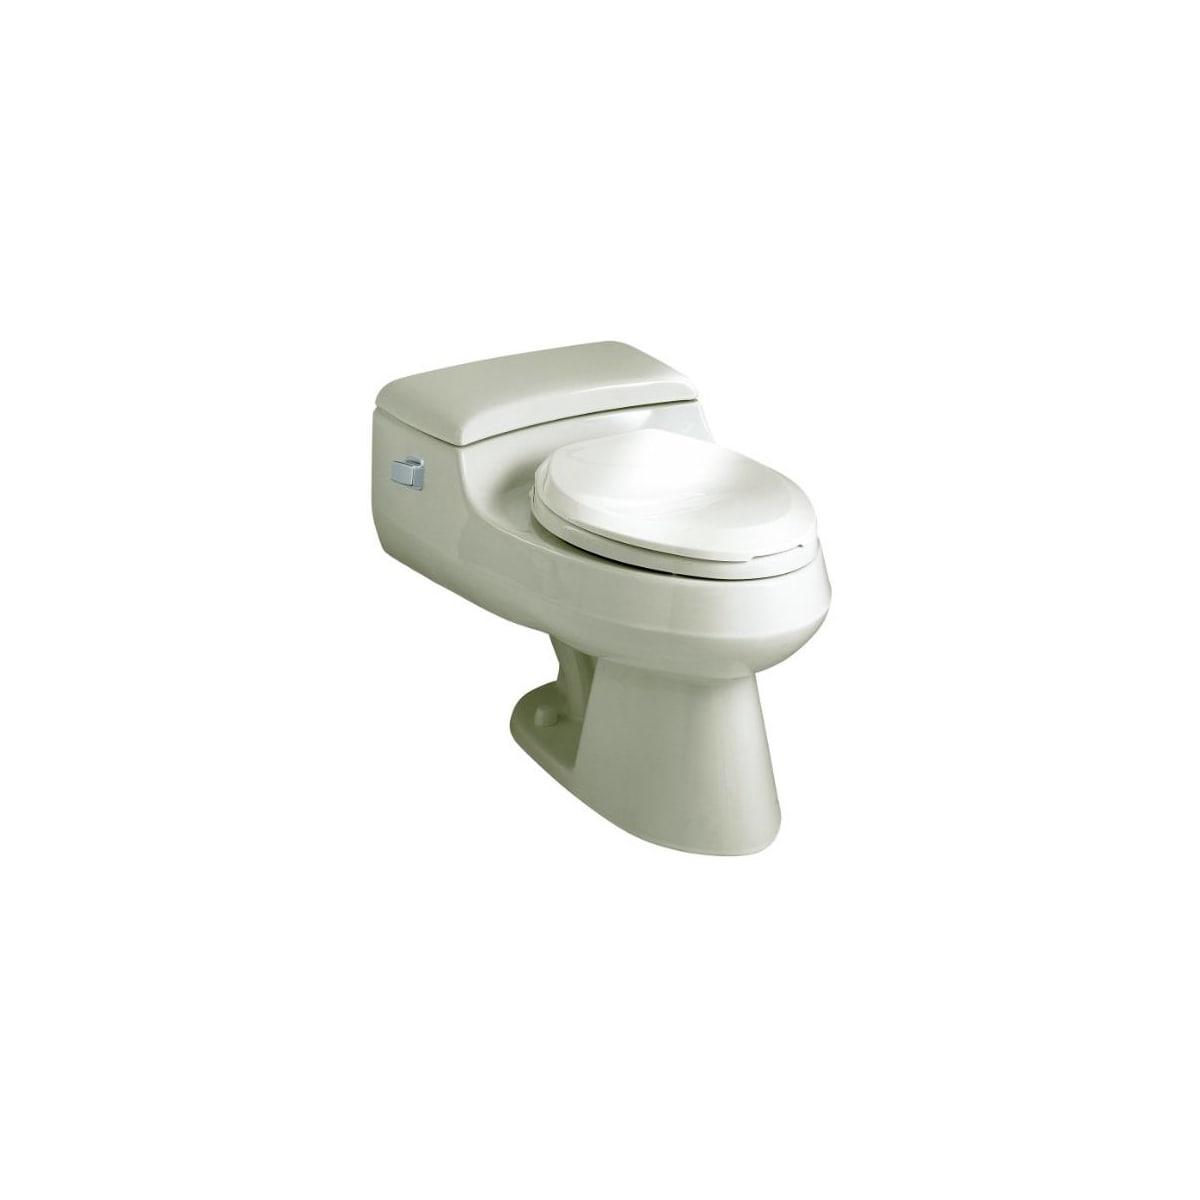 Brilliant Kohler K 3597 Nf 96 Biscuit Comfort Height Pressure Lite 1 0 Dailytribune Chair Design For Home Dailytribuneorg